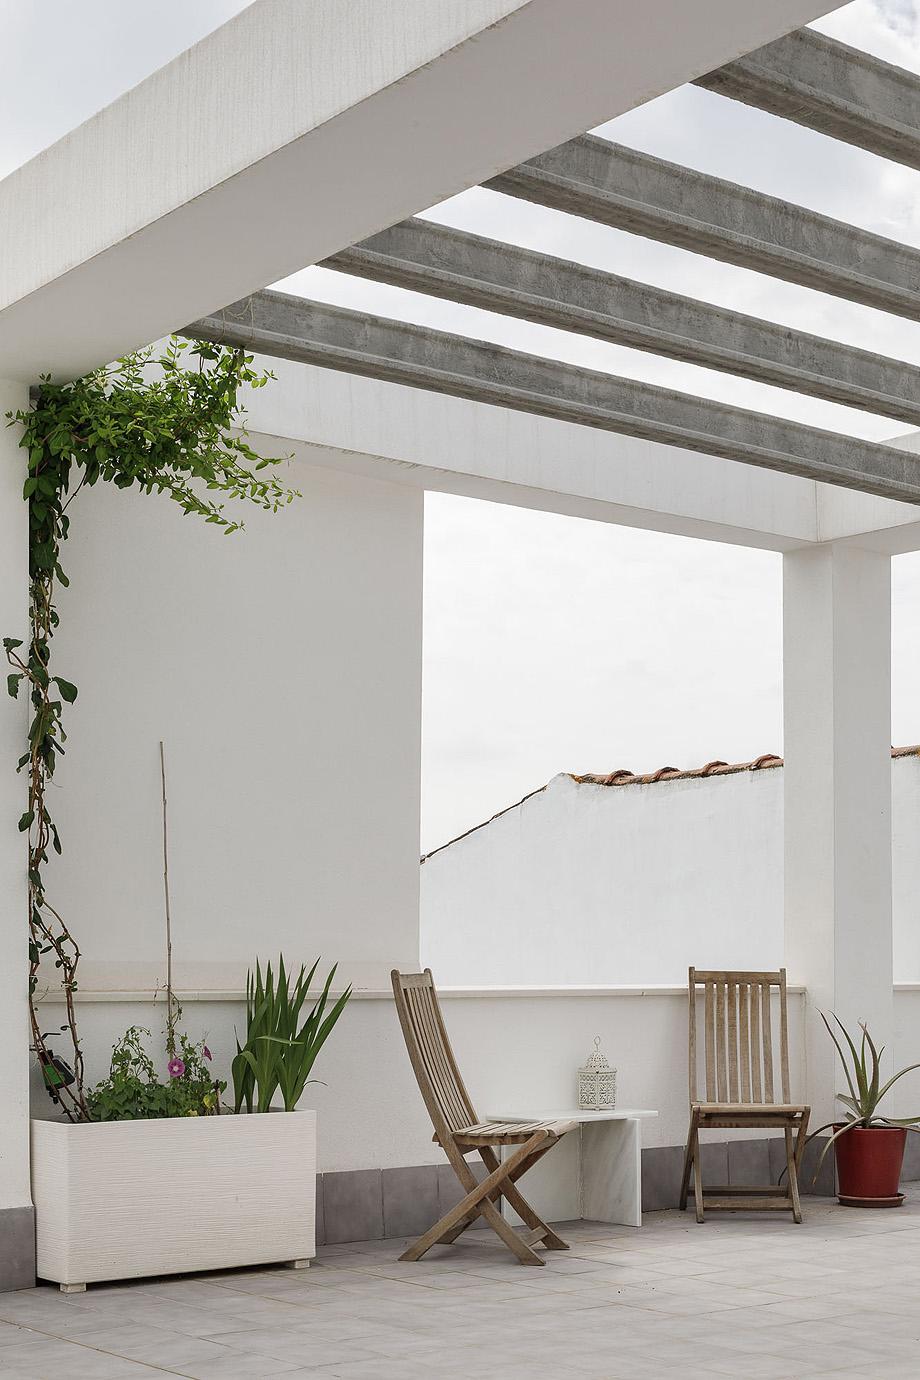 casa cr en sevilla de faq arquitectura - foto fernando alda (14)